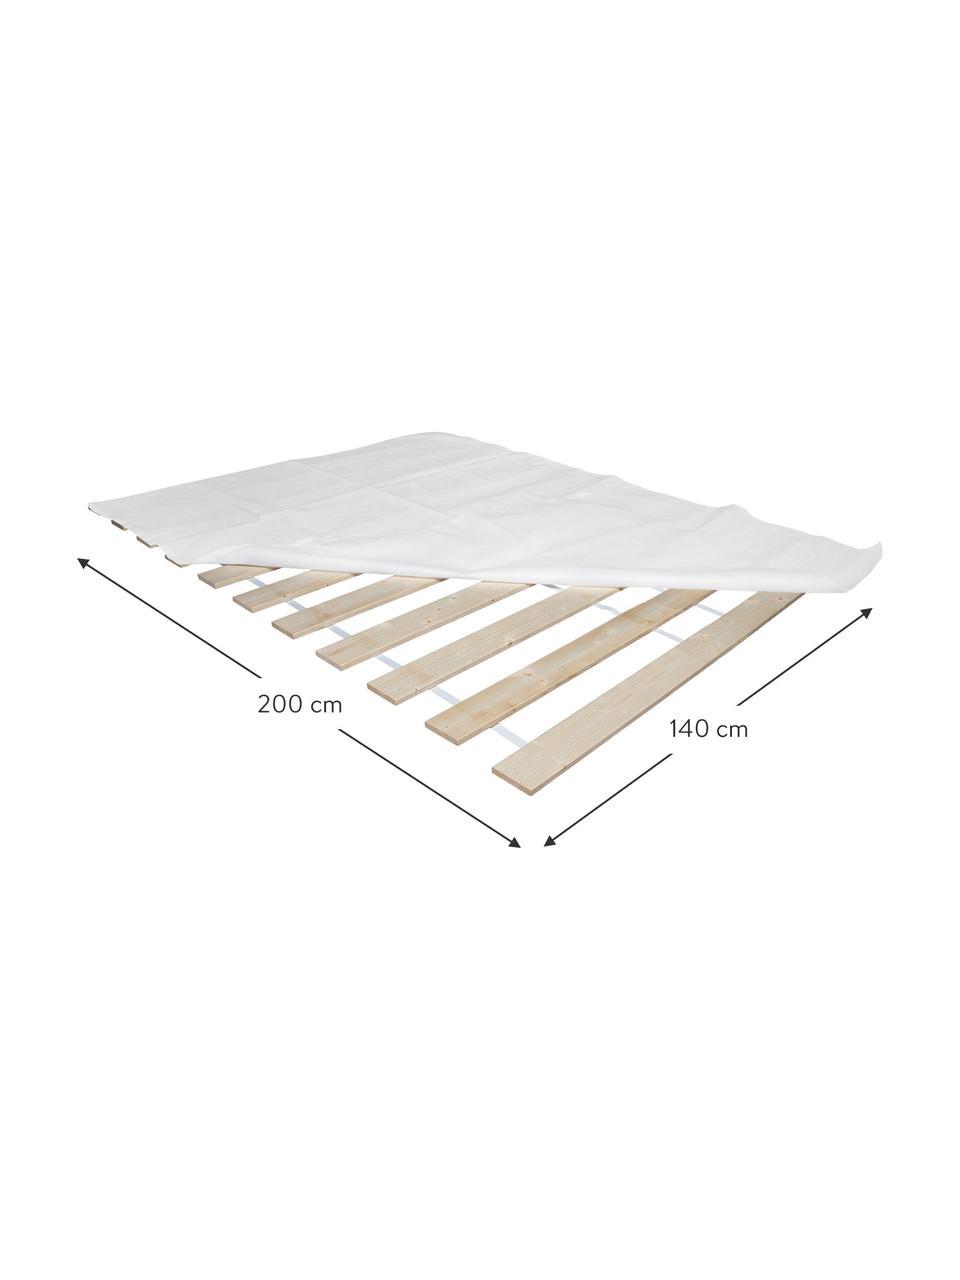 Rollrost 2er-Set Juan Carlos, Leisten: Massives Tannenholz, Leisten: Helles HolzAbdeckung: weiß, 180 x 200 cm